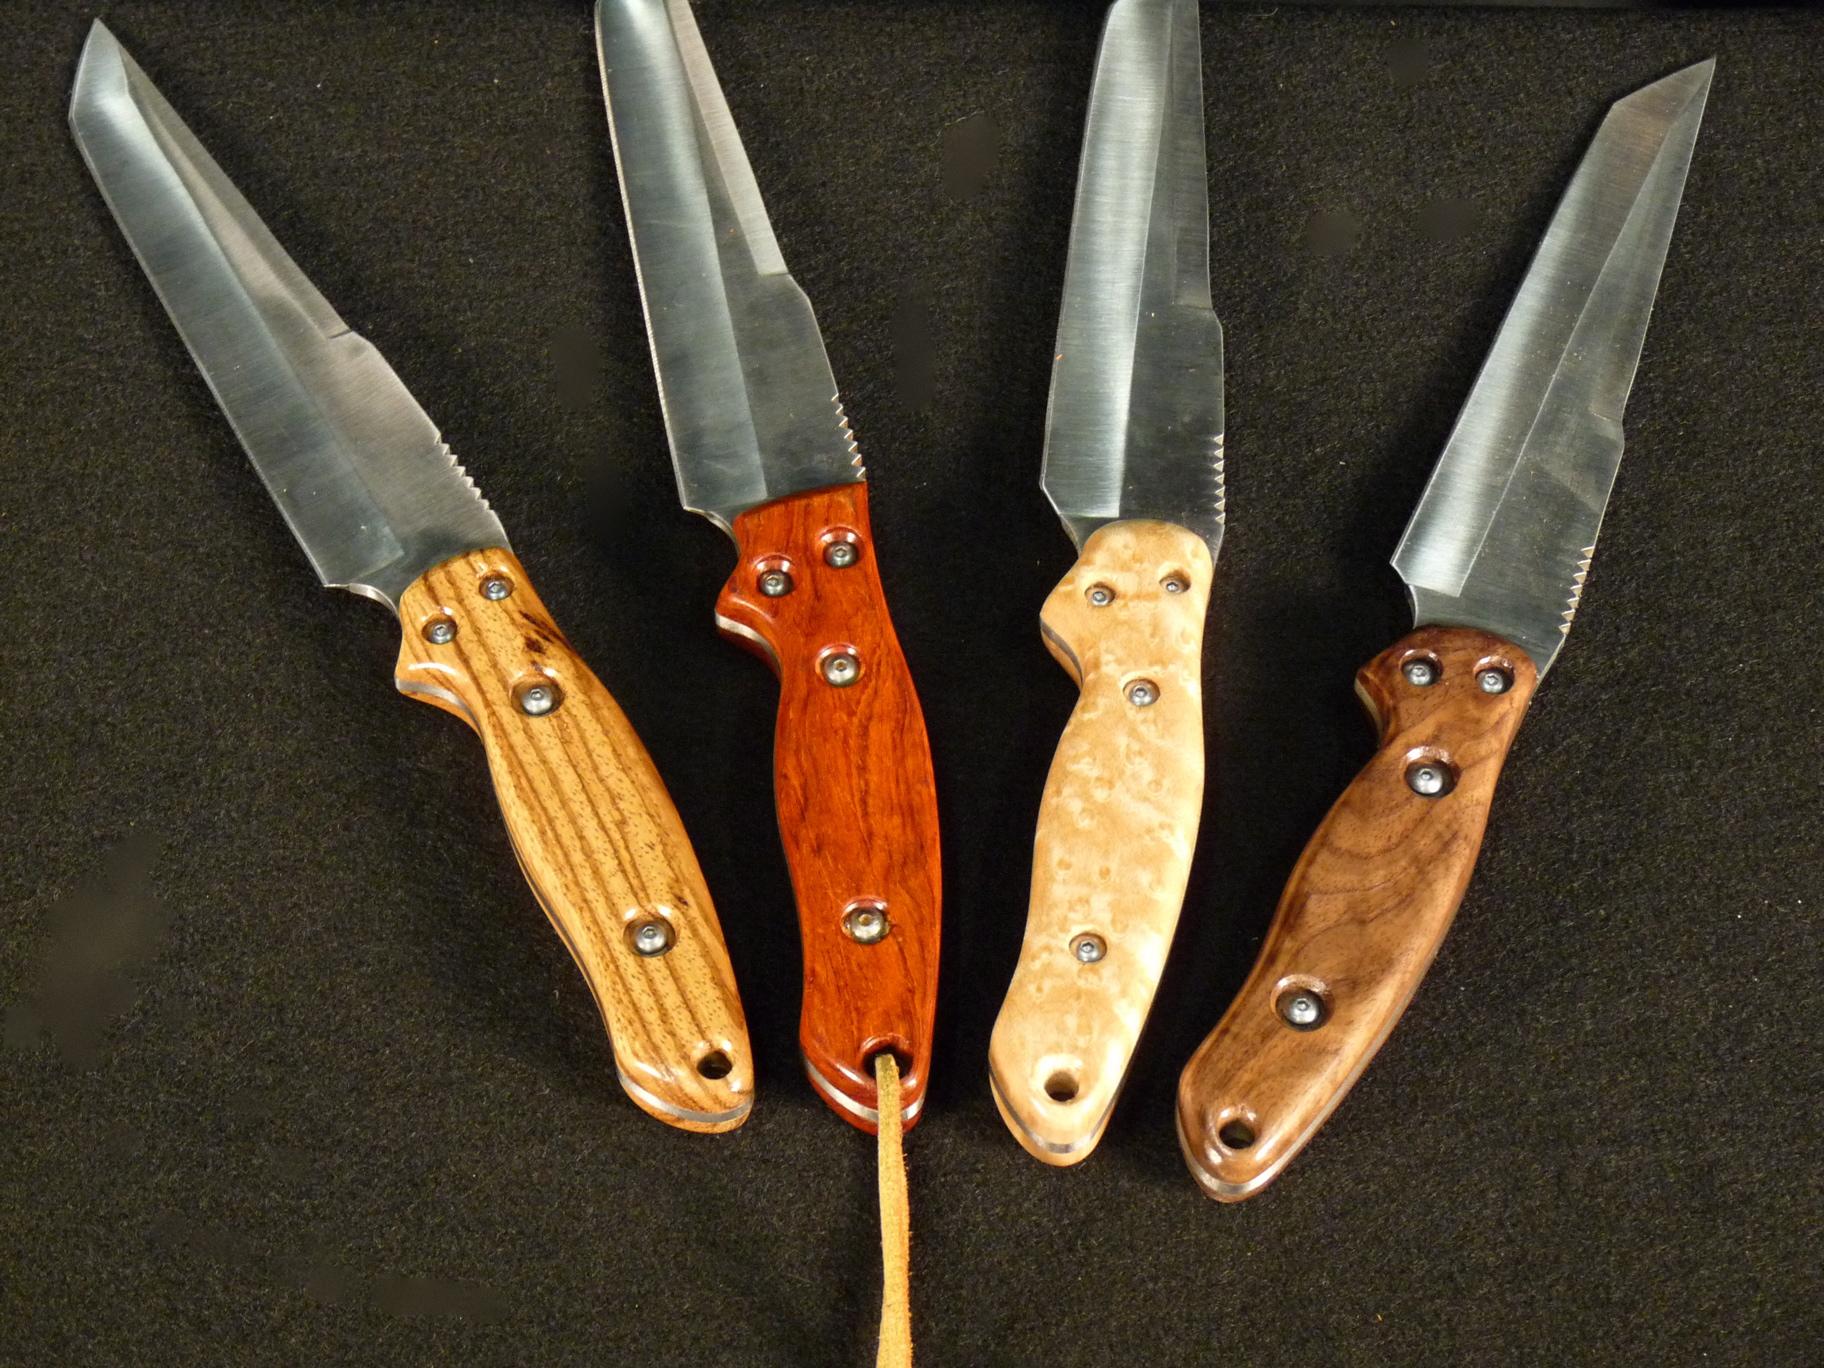 Zebrawood, Cocobolo, Birdseye Maple, Walnut knife handles